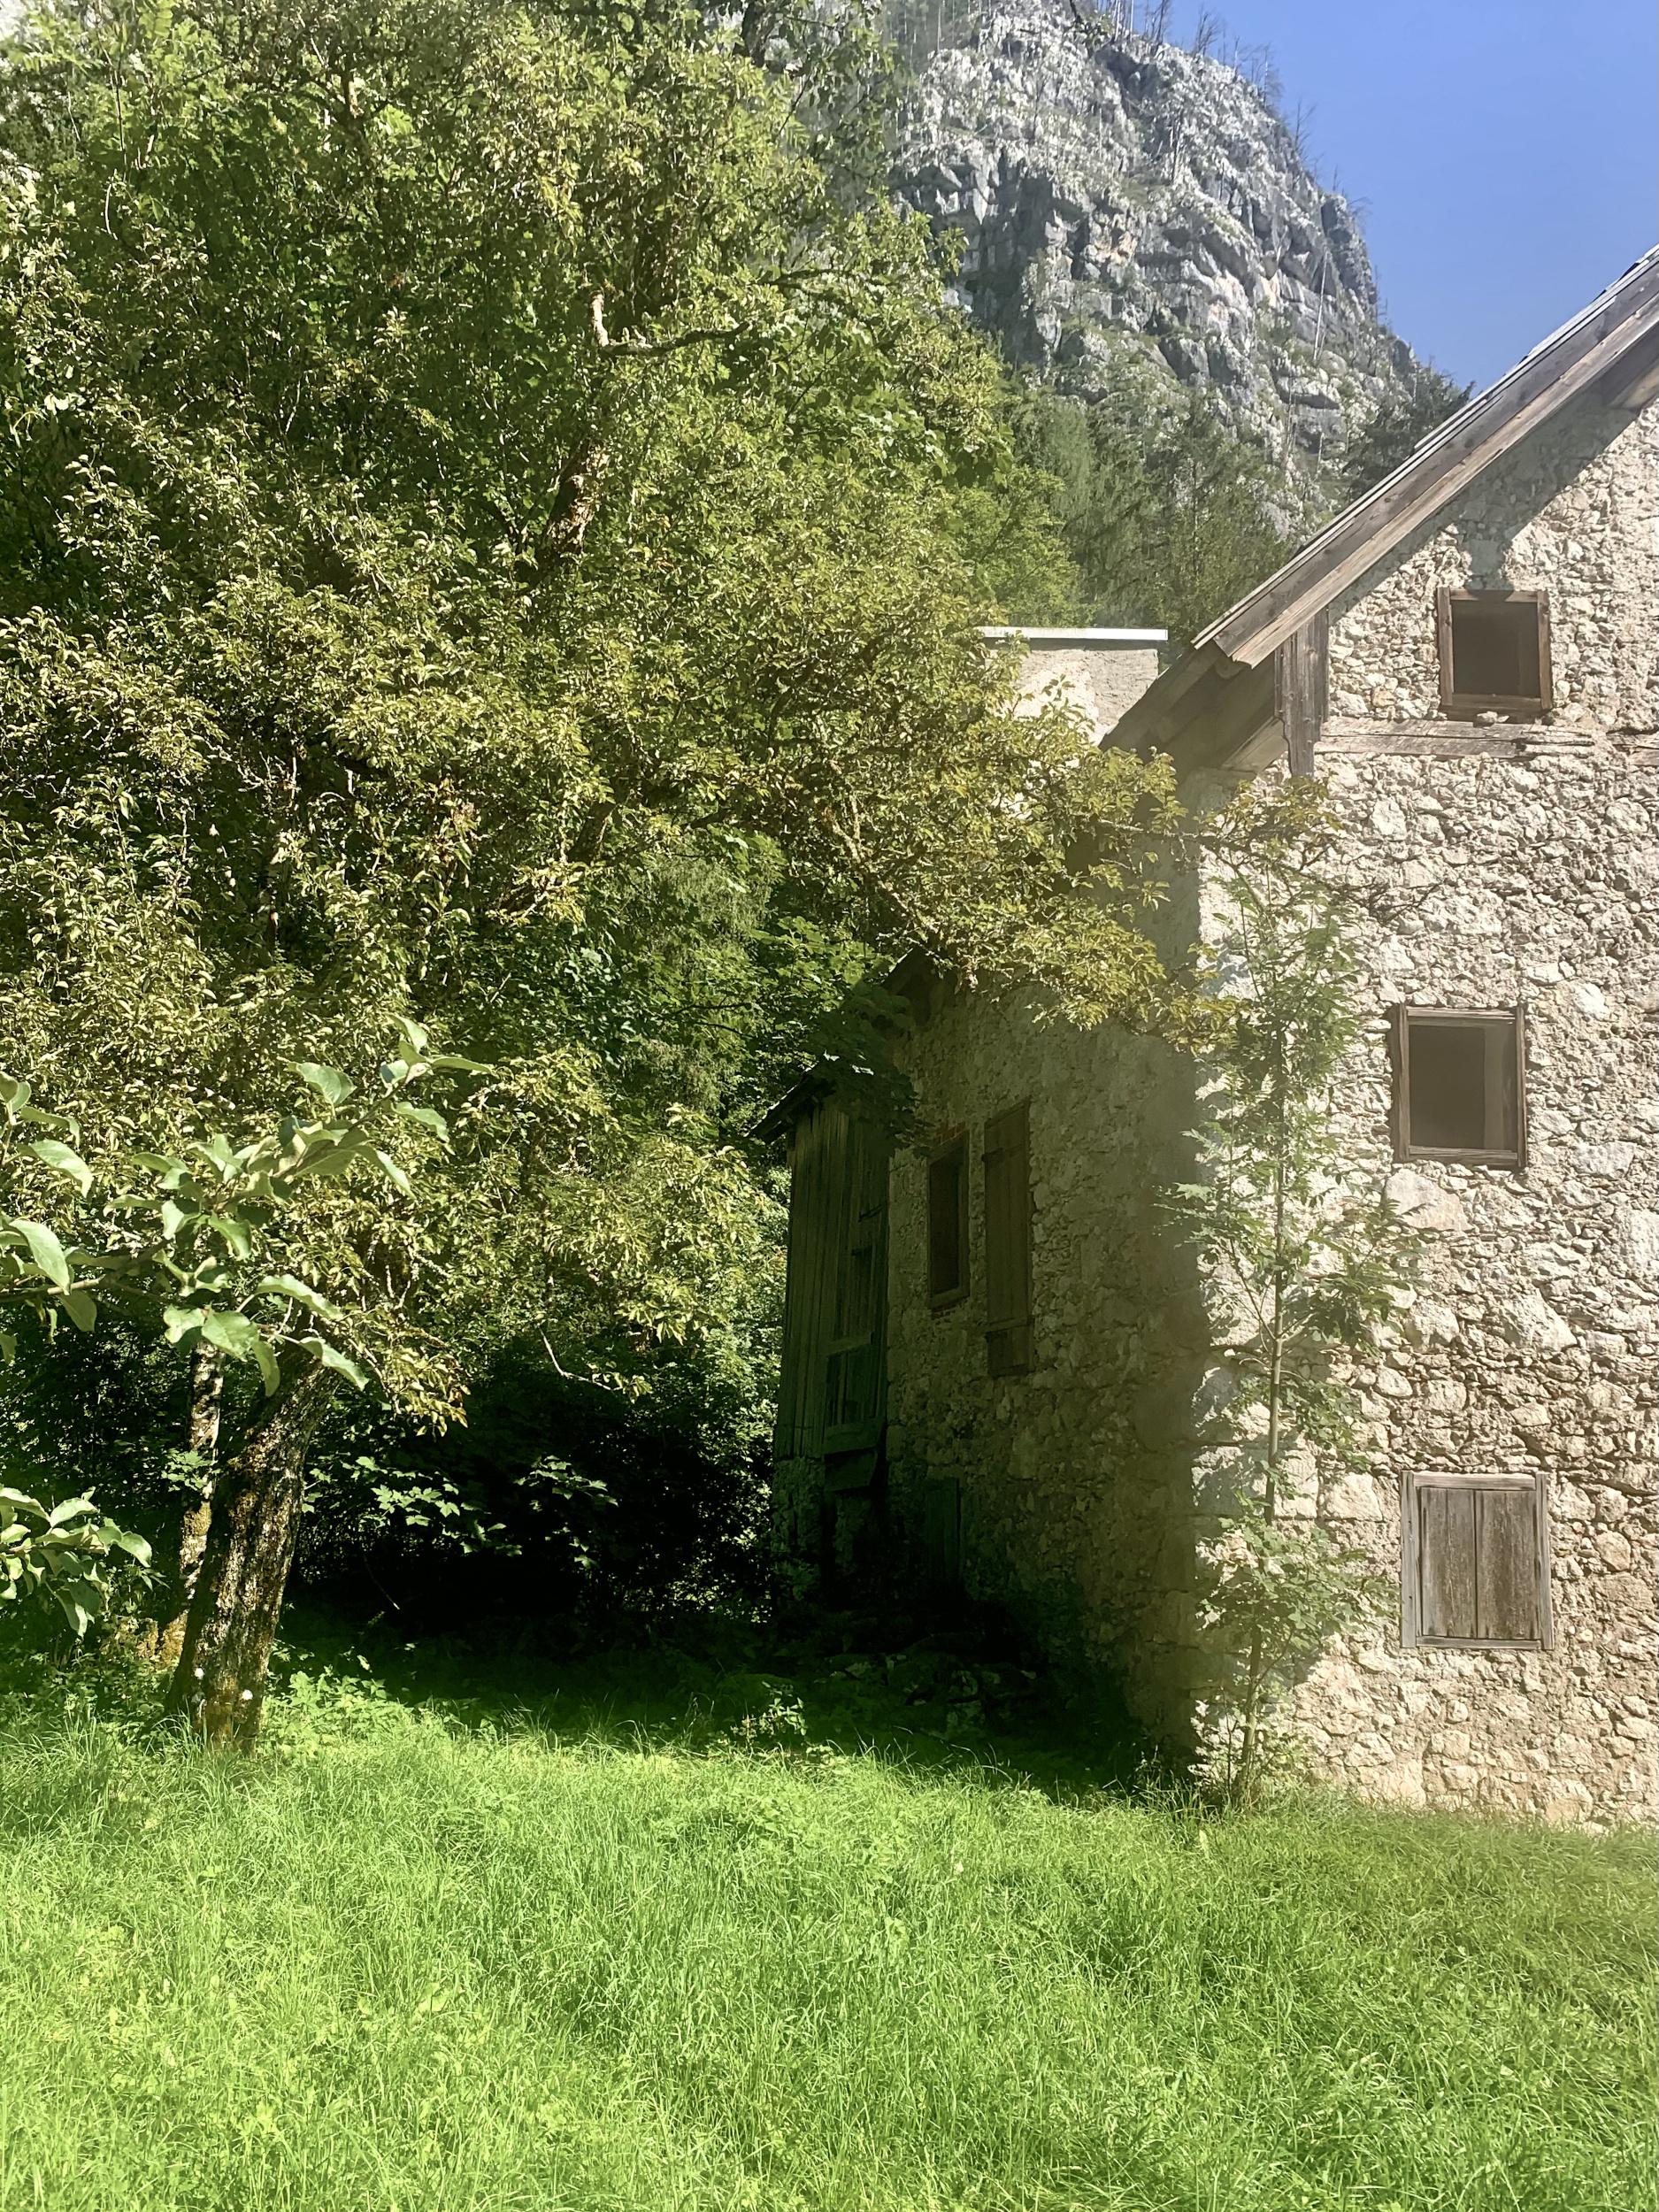 Old Stone House in Hallstatt on Echern Valley Path